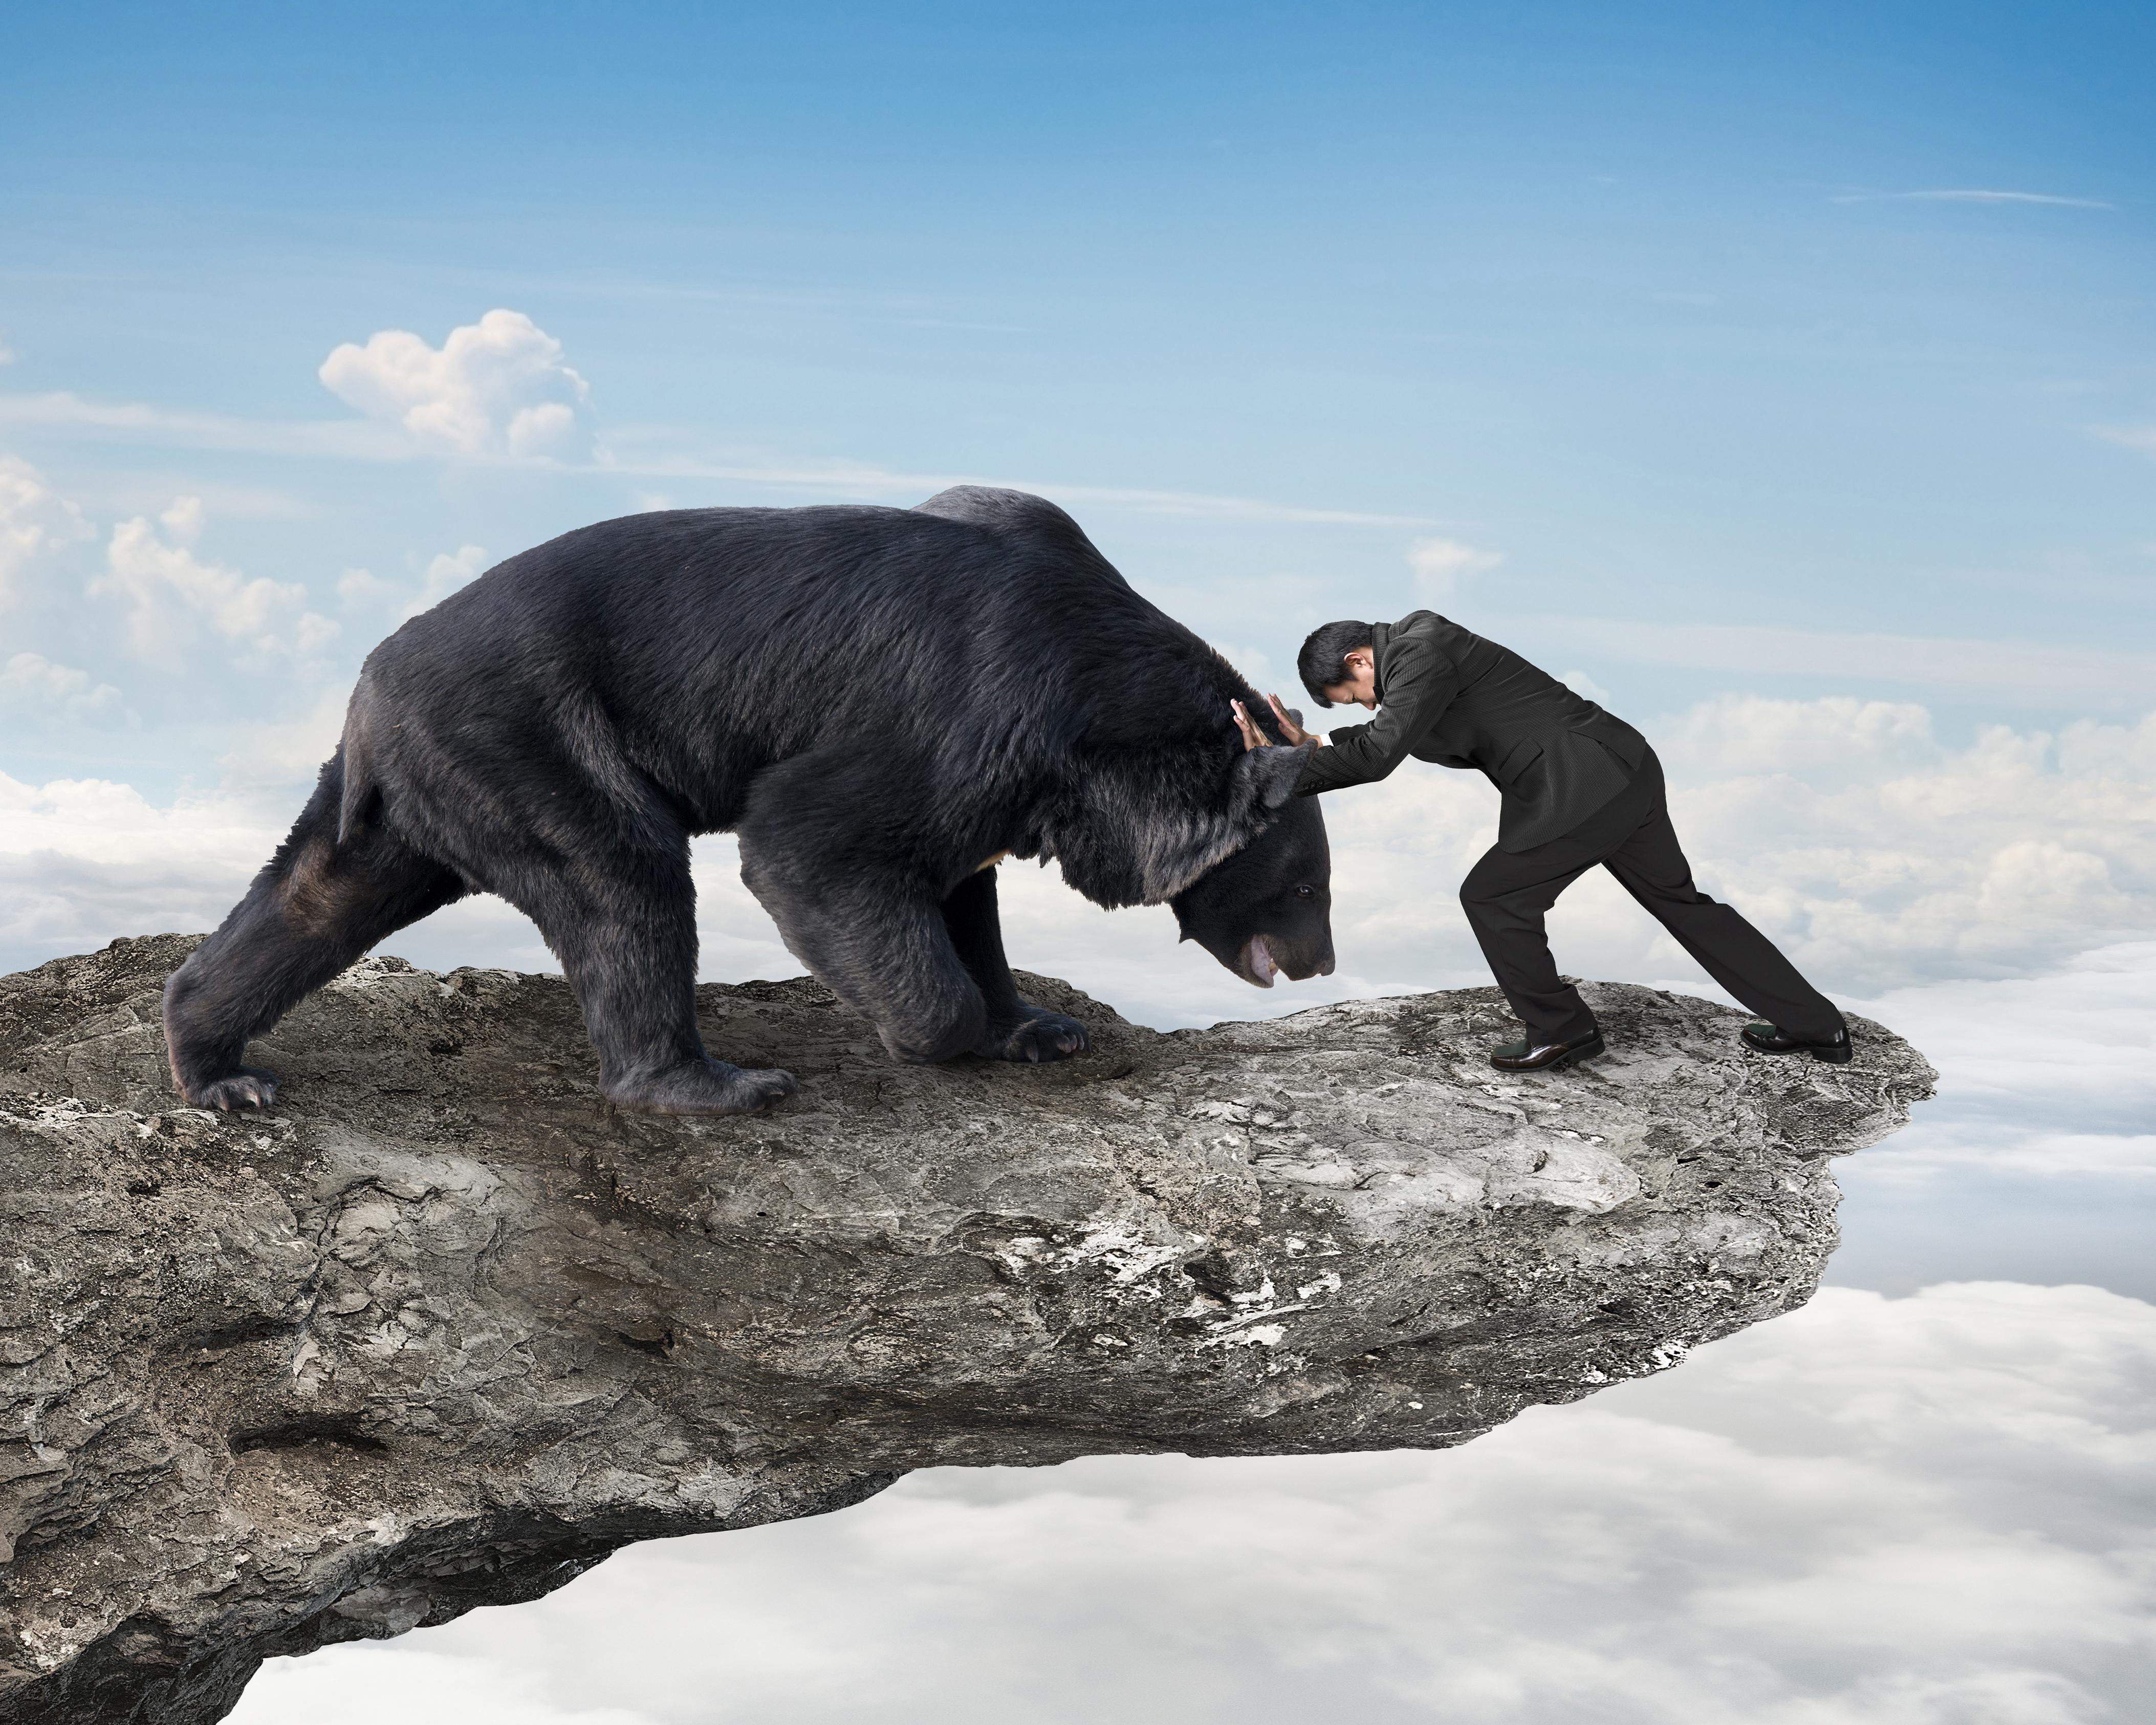 Man Fights Bear; Bear Wins